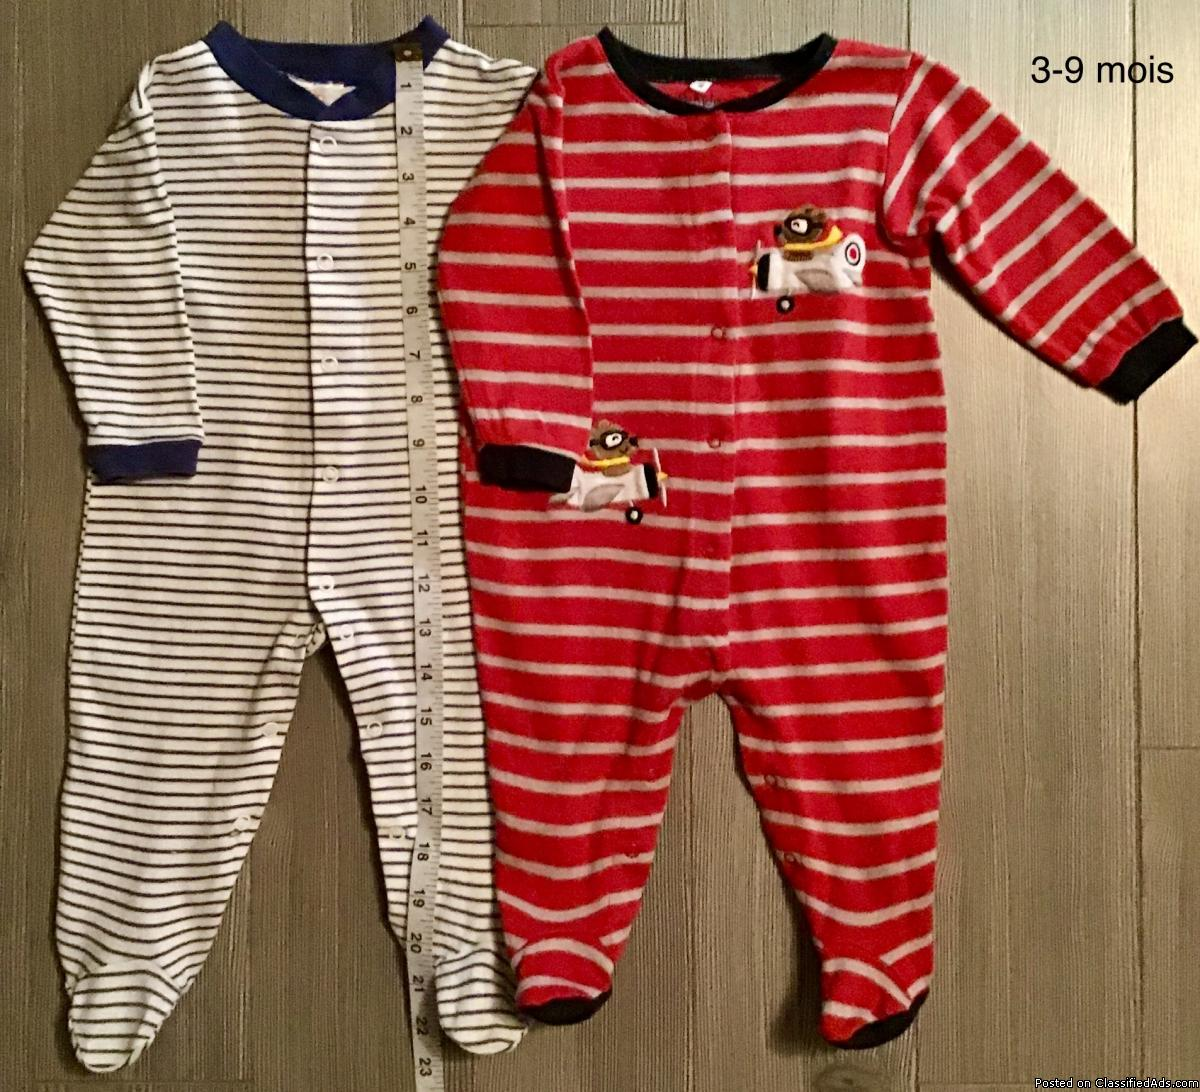 Pyjamas pour bébé garçon 3-9 mois /Pajamas for baby boy